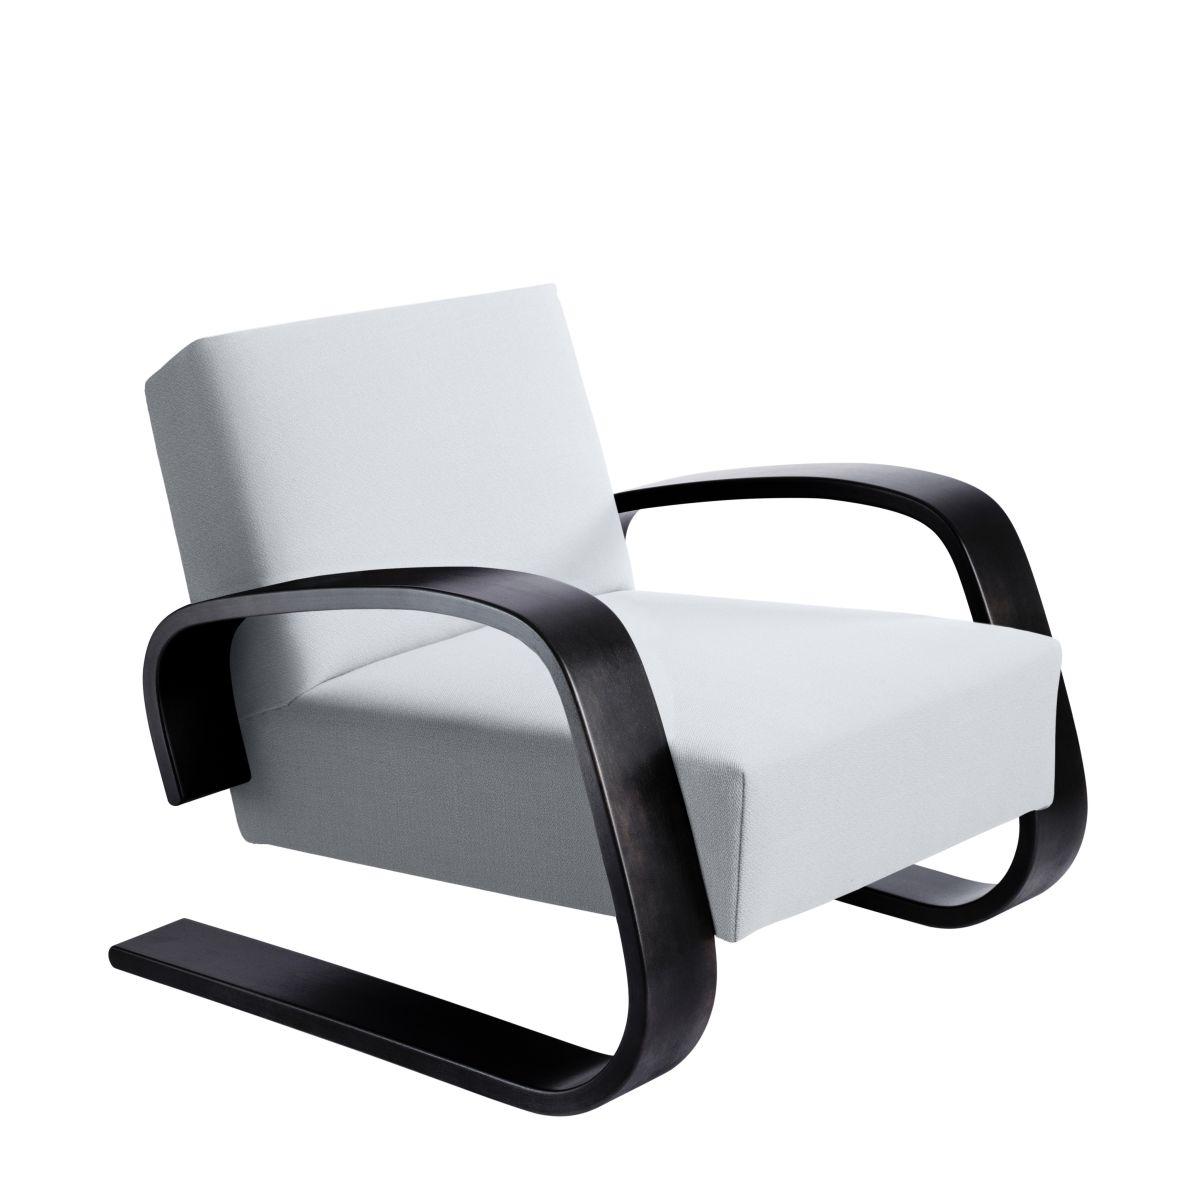 Armchair 400 _Tank  legs black laquered birch_seat fabric upholstery Artek grey